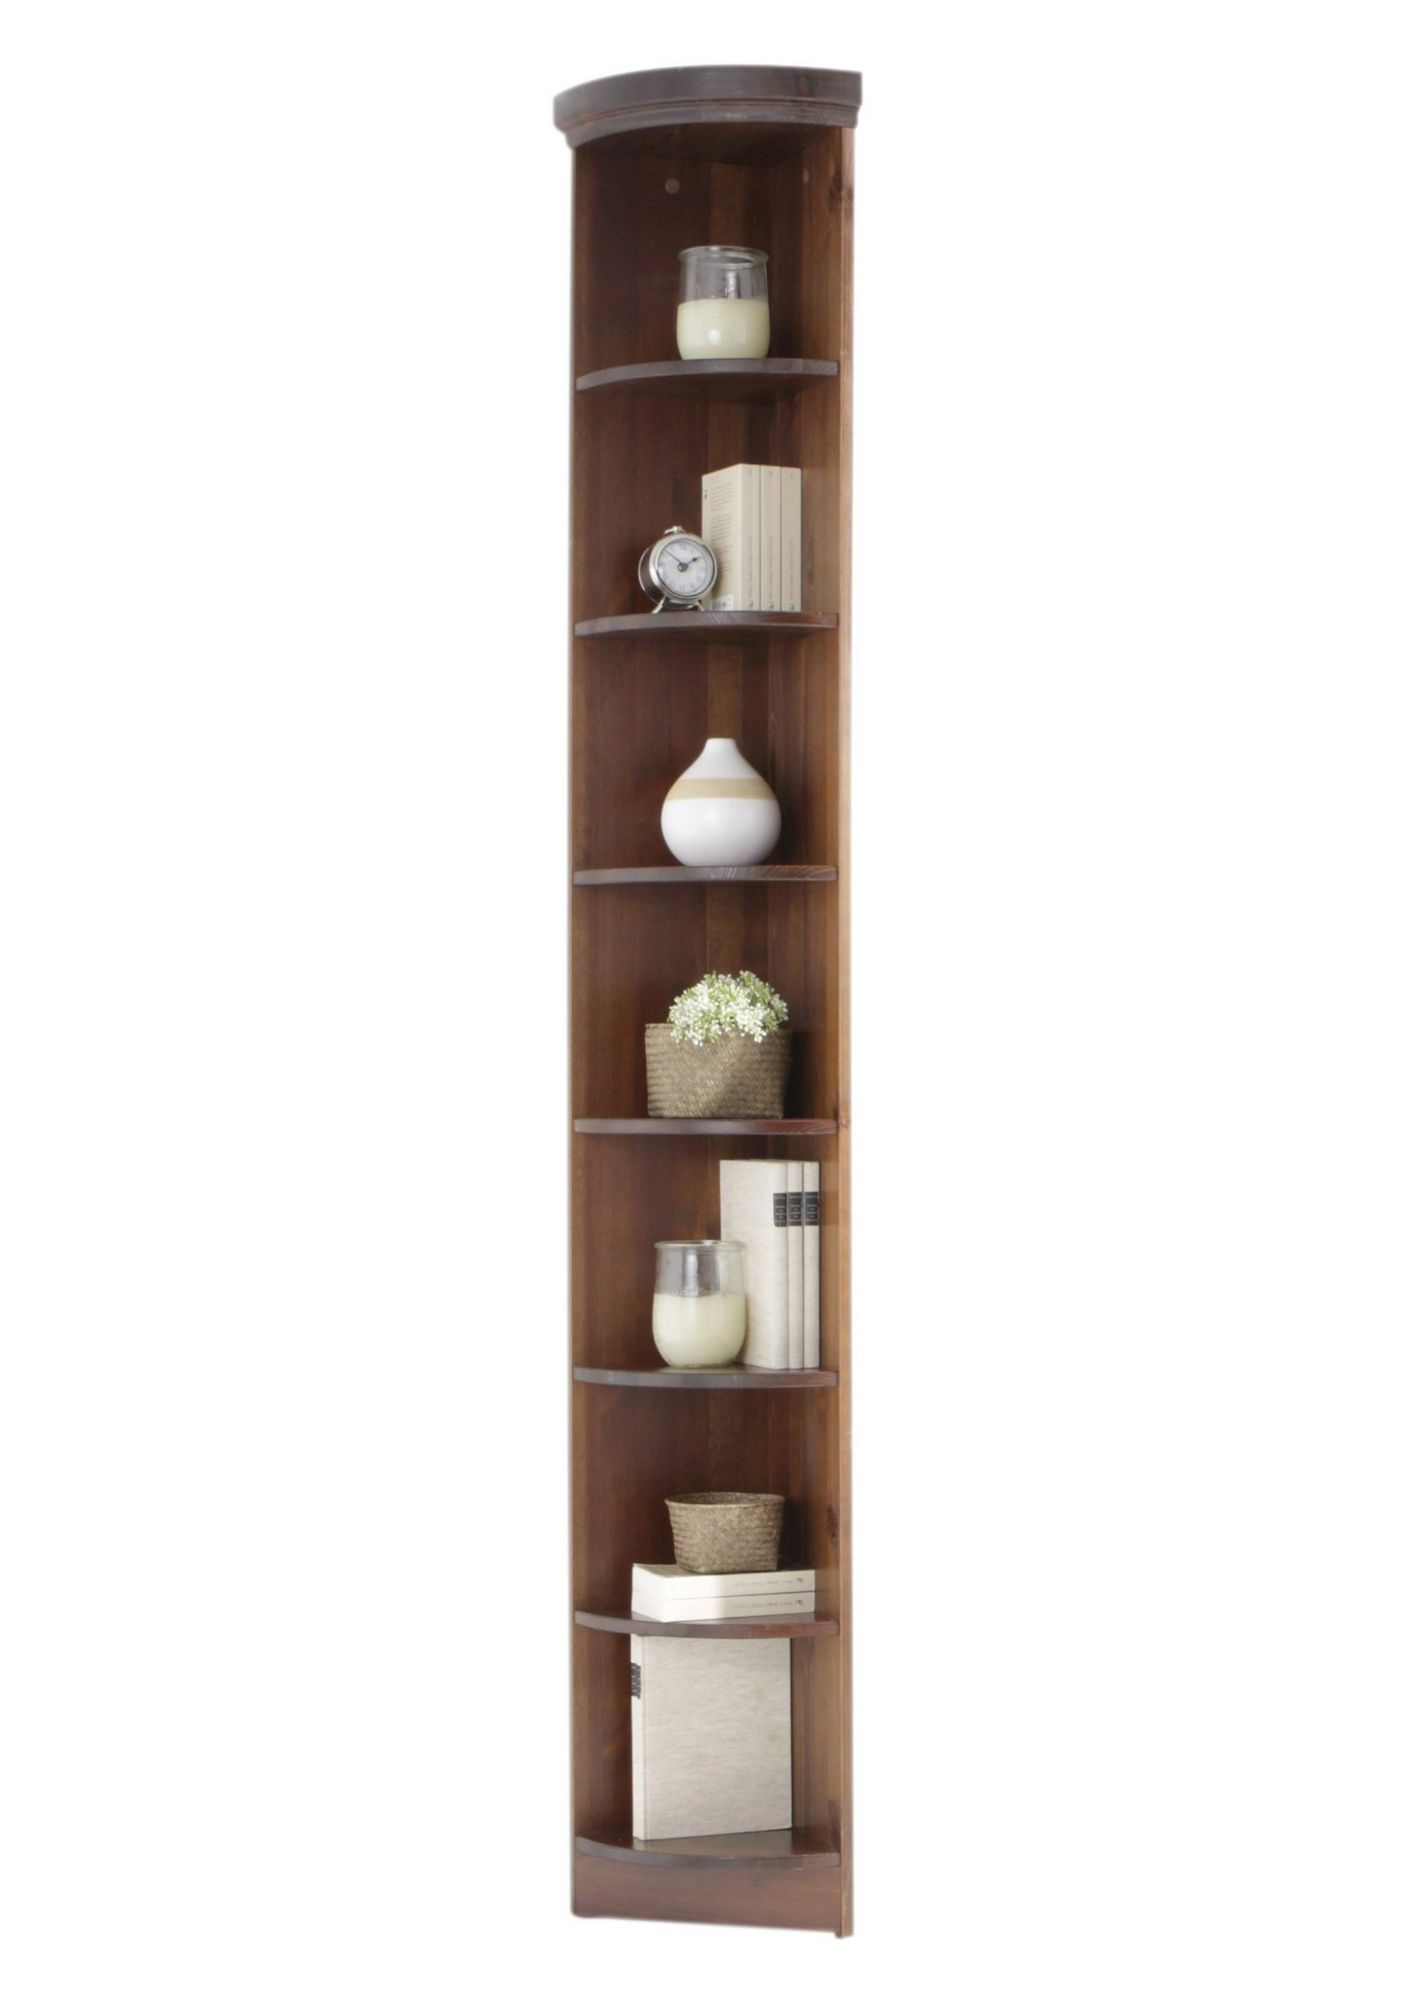 HOME AFFAIRE Abschlussregal, Home affaire, »Soeren«, Höhe 220 cm, Tiefe 29 cm